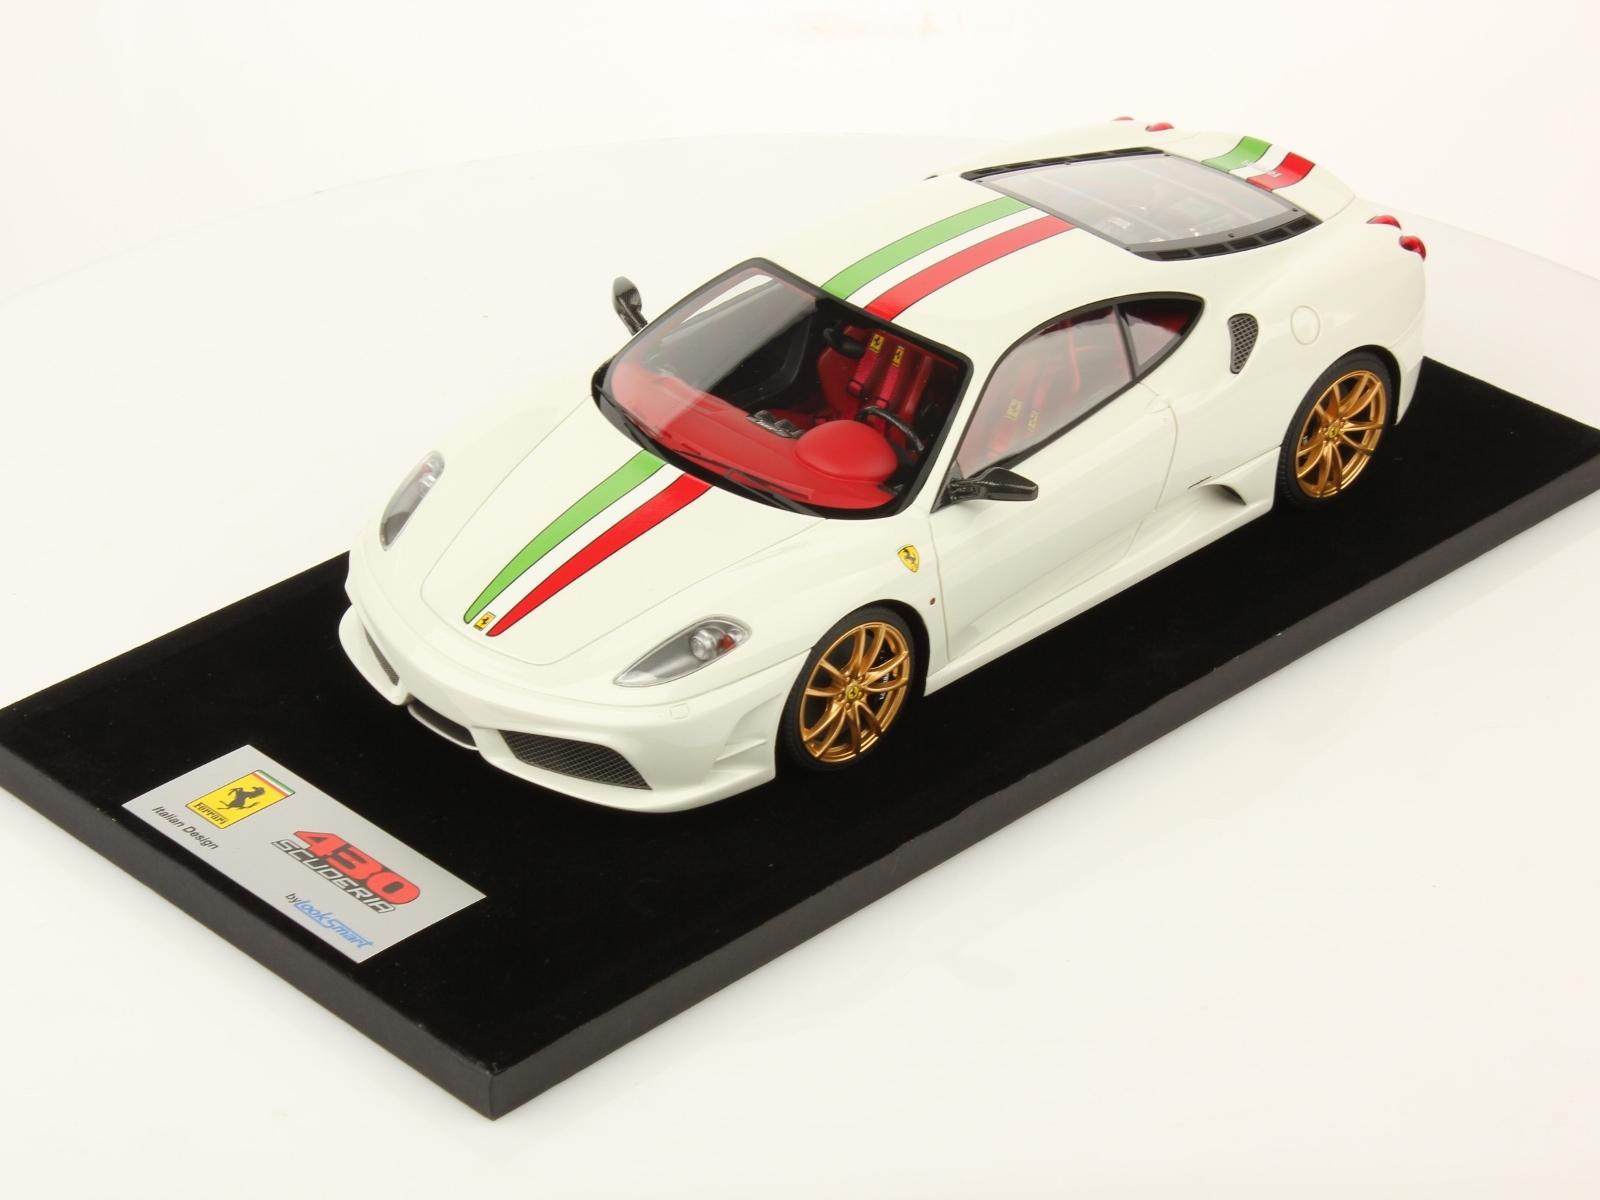 Ferrari F430 Scuderia 1 18 Looksmart Models